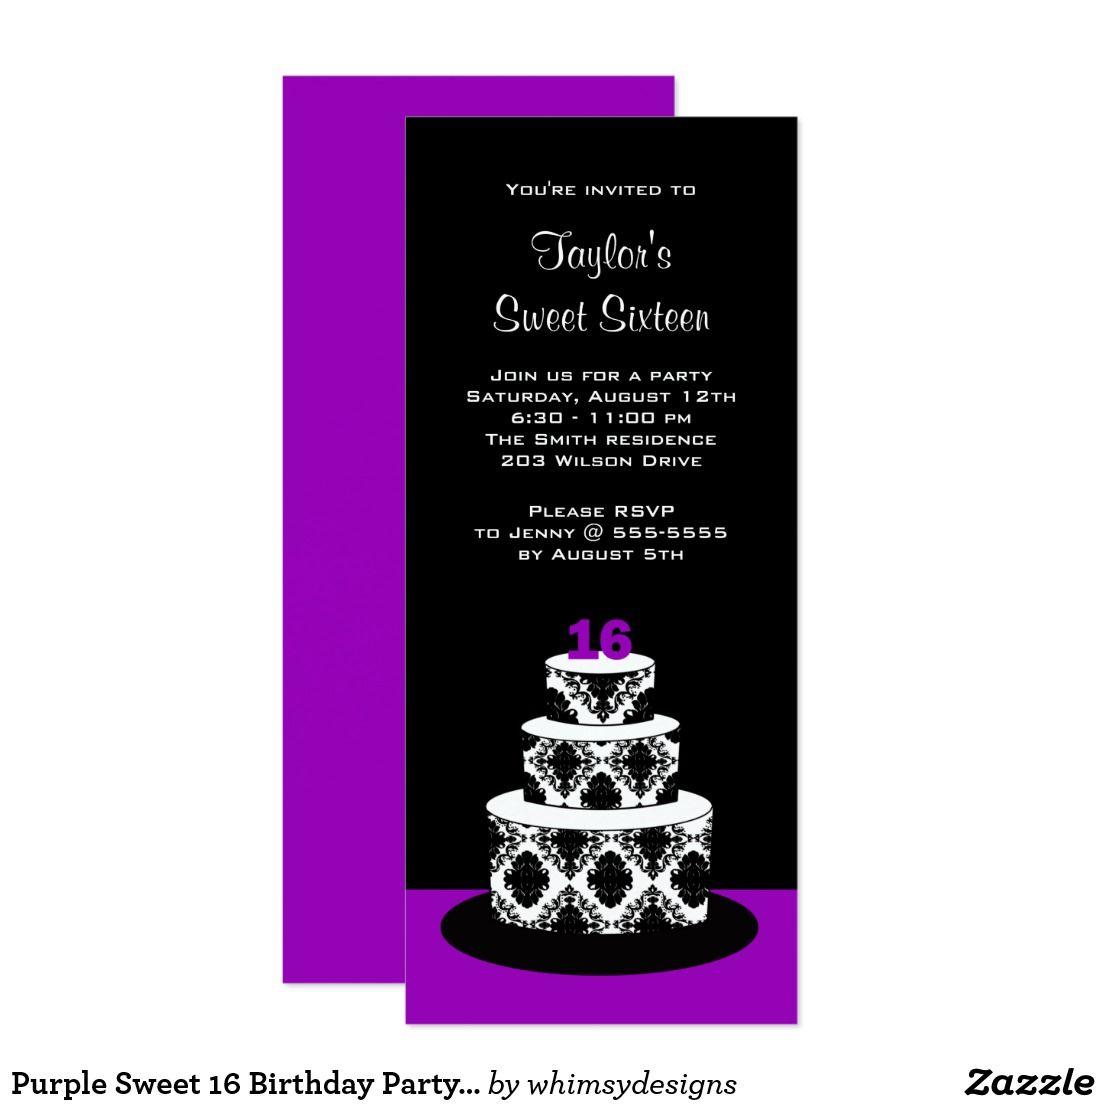 Purple Sweet 16 Birthday Party Invitations | Purple sweet 16 ...